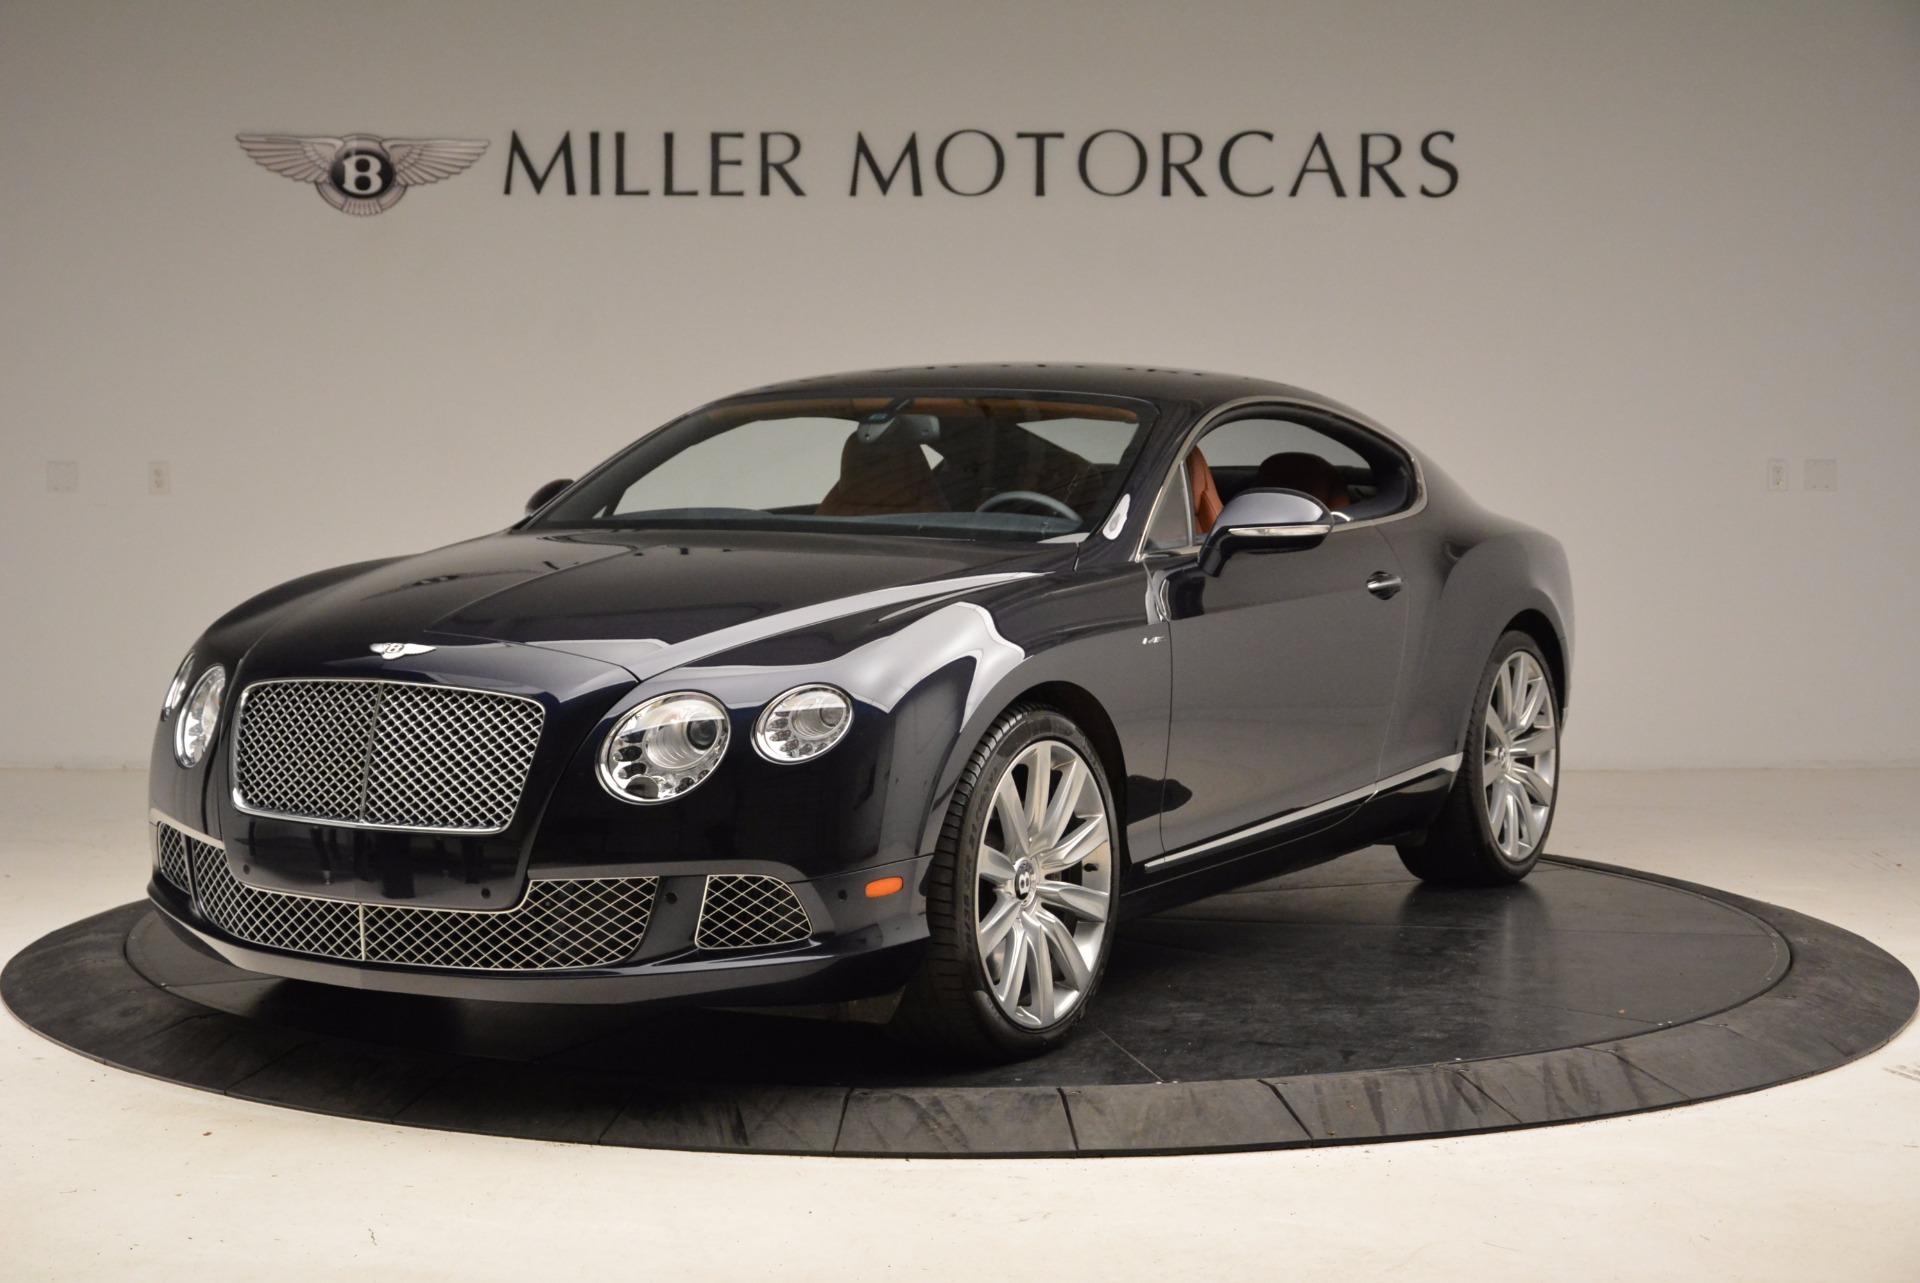 Used 2014 Bentley Continental GT W12 for sale Sold at Alfa Romeo of Westport in Westport CT 06880 1